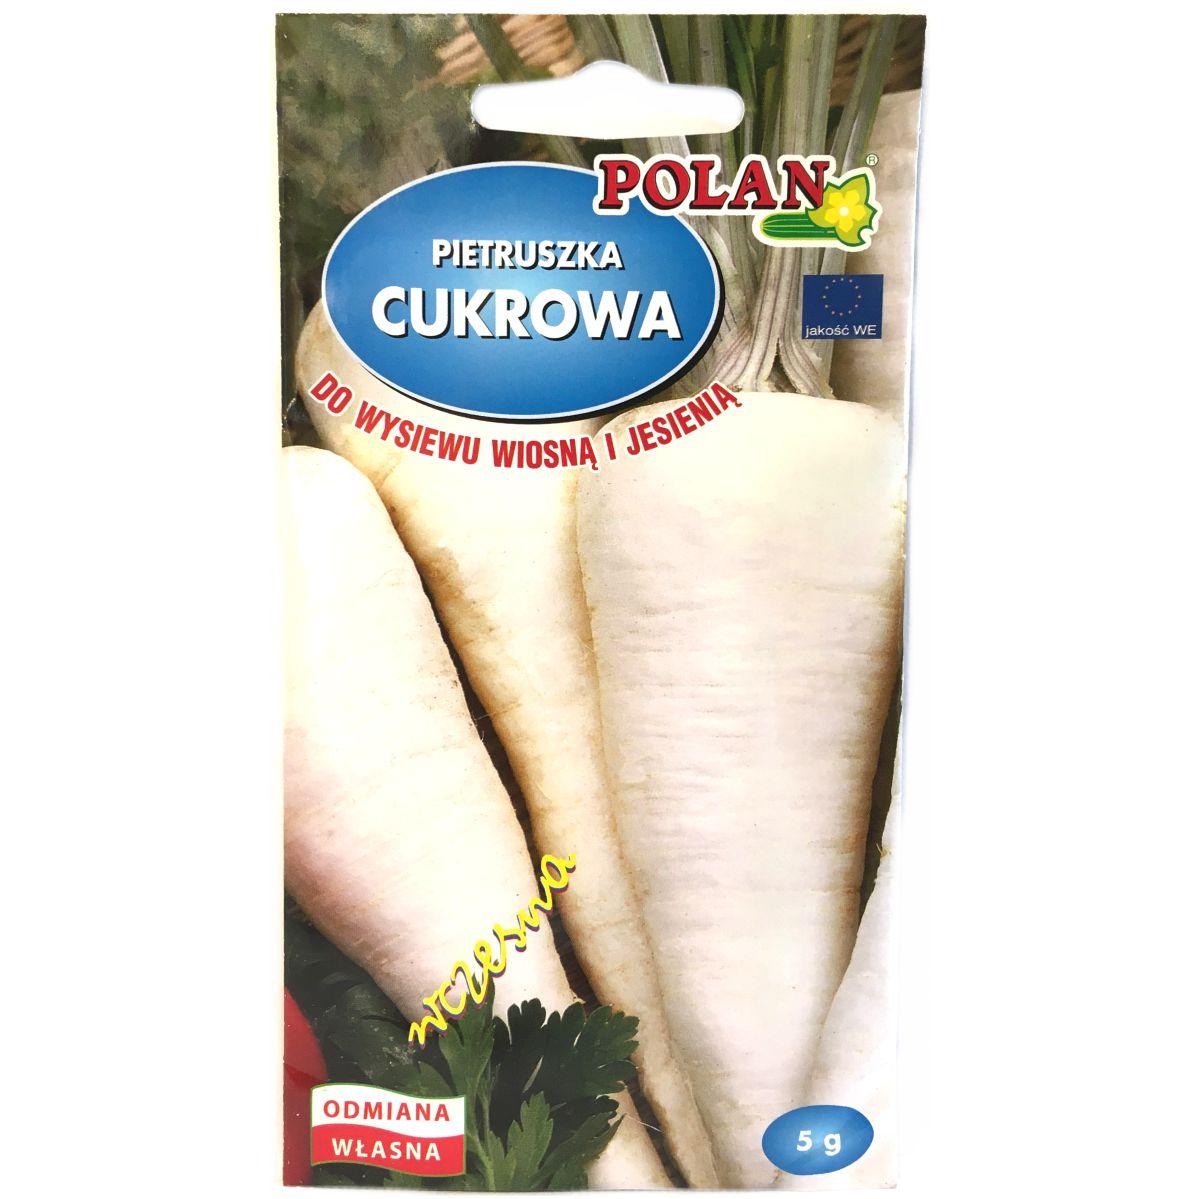 Pietruszka Cukrowa nasiona Polan